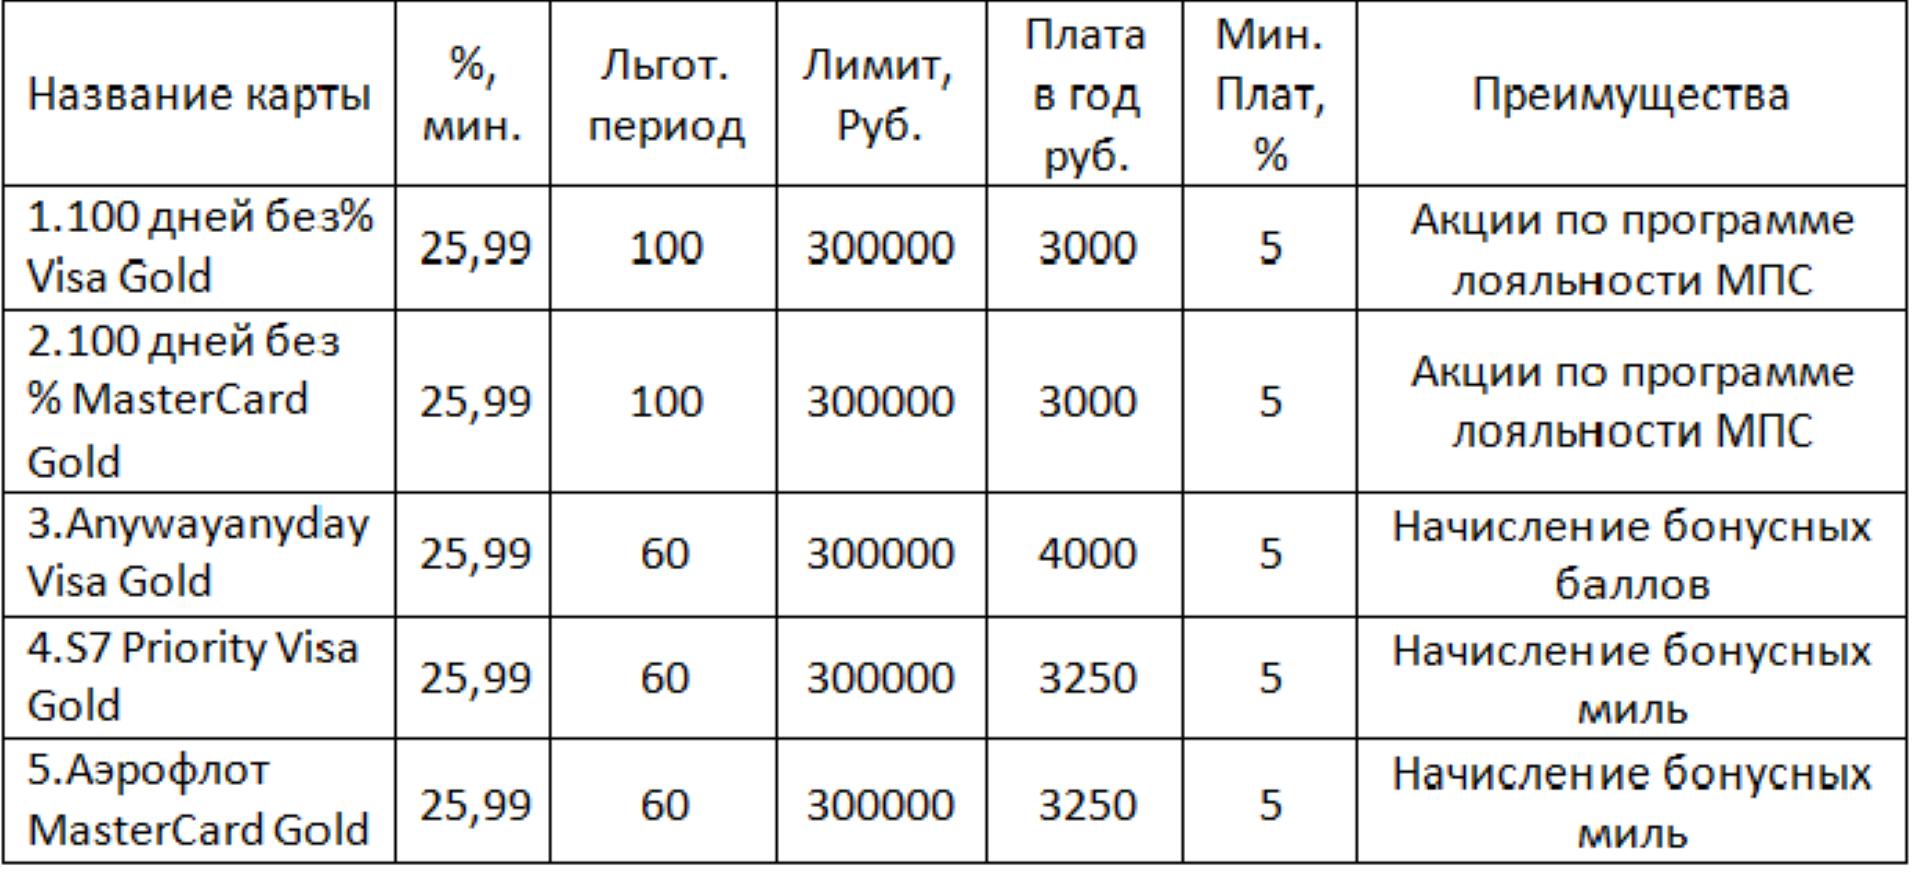 Сбербанк заявка на ипотеку по 2 документам